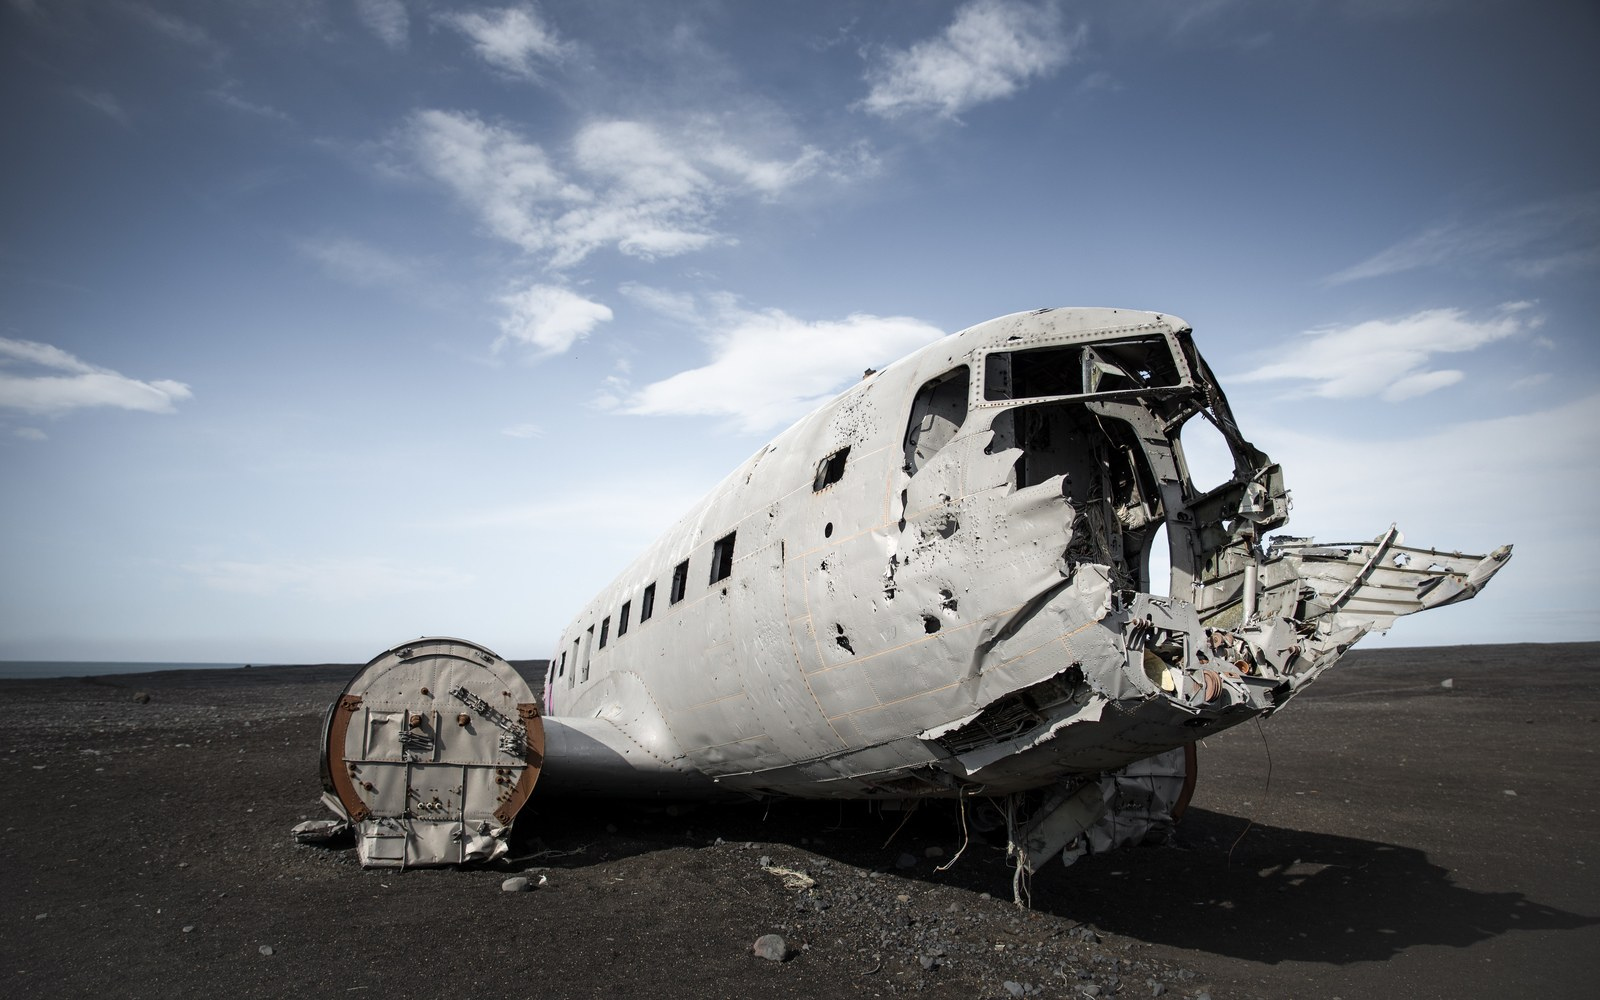 Islande France Avion